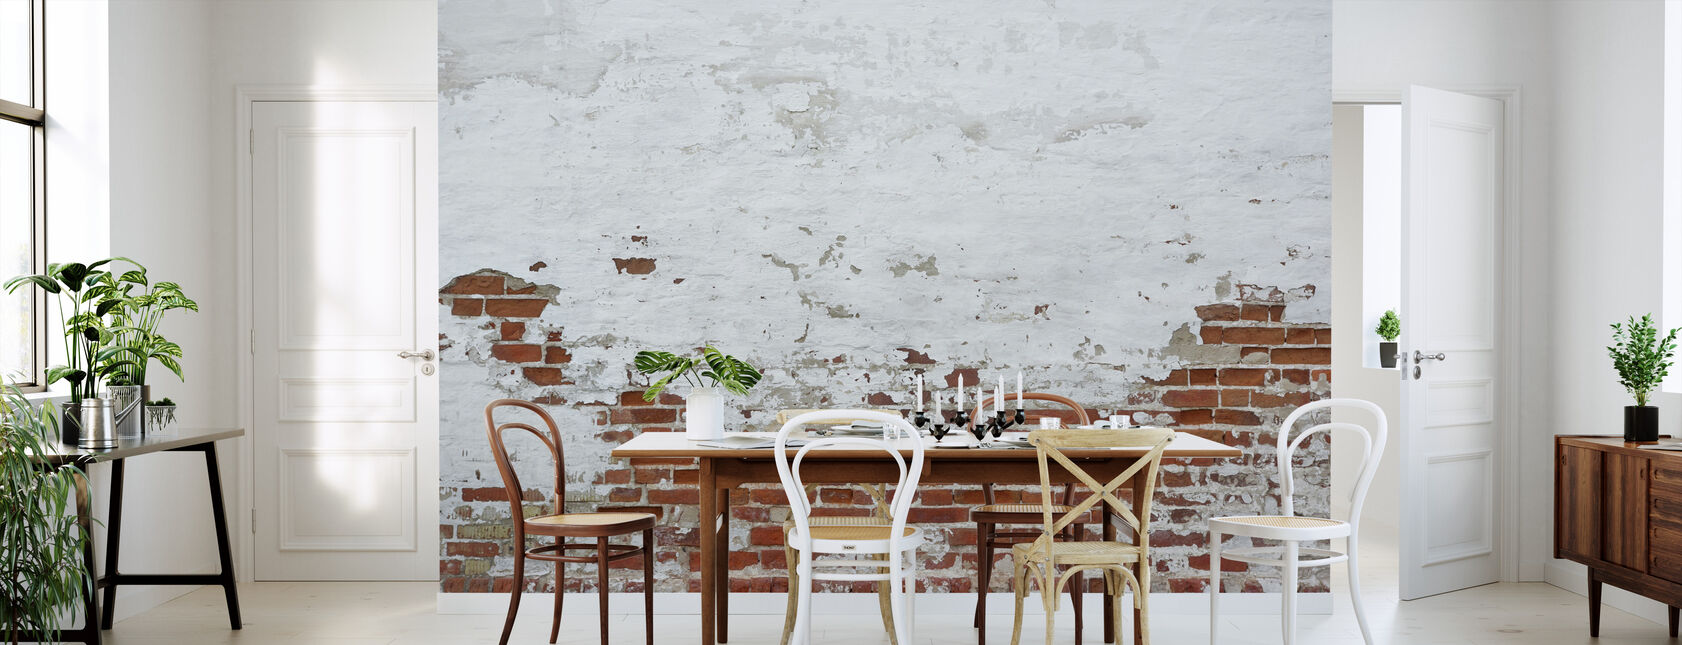 Sprinkled White Plaster on Red Brick Wall - Wallpaper - Kitchen